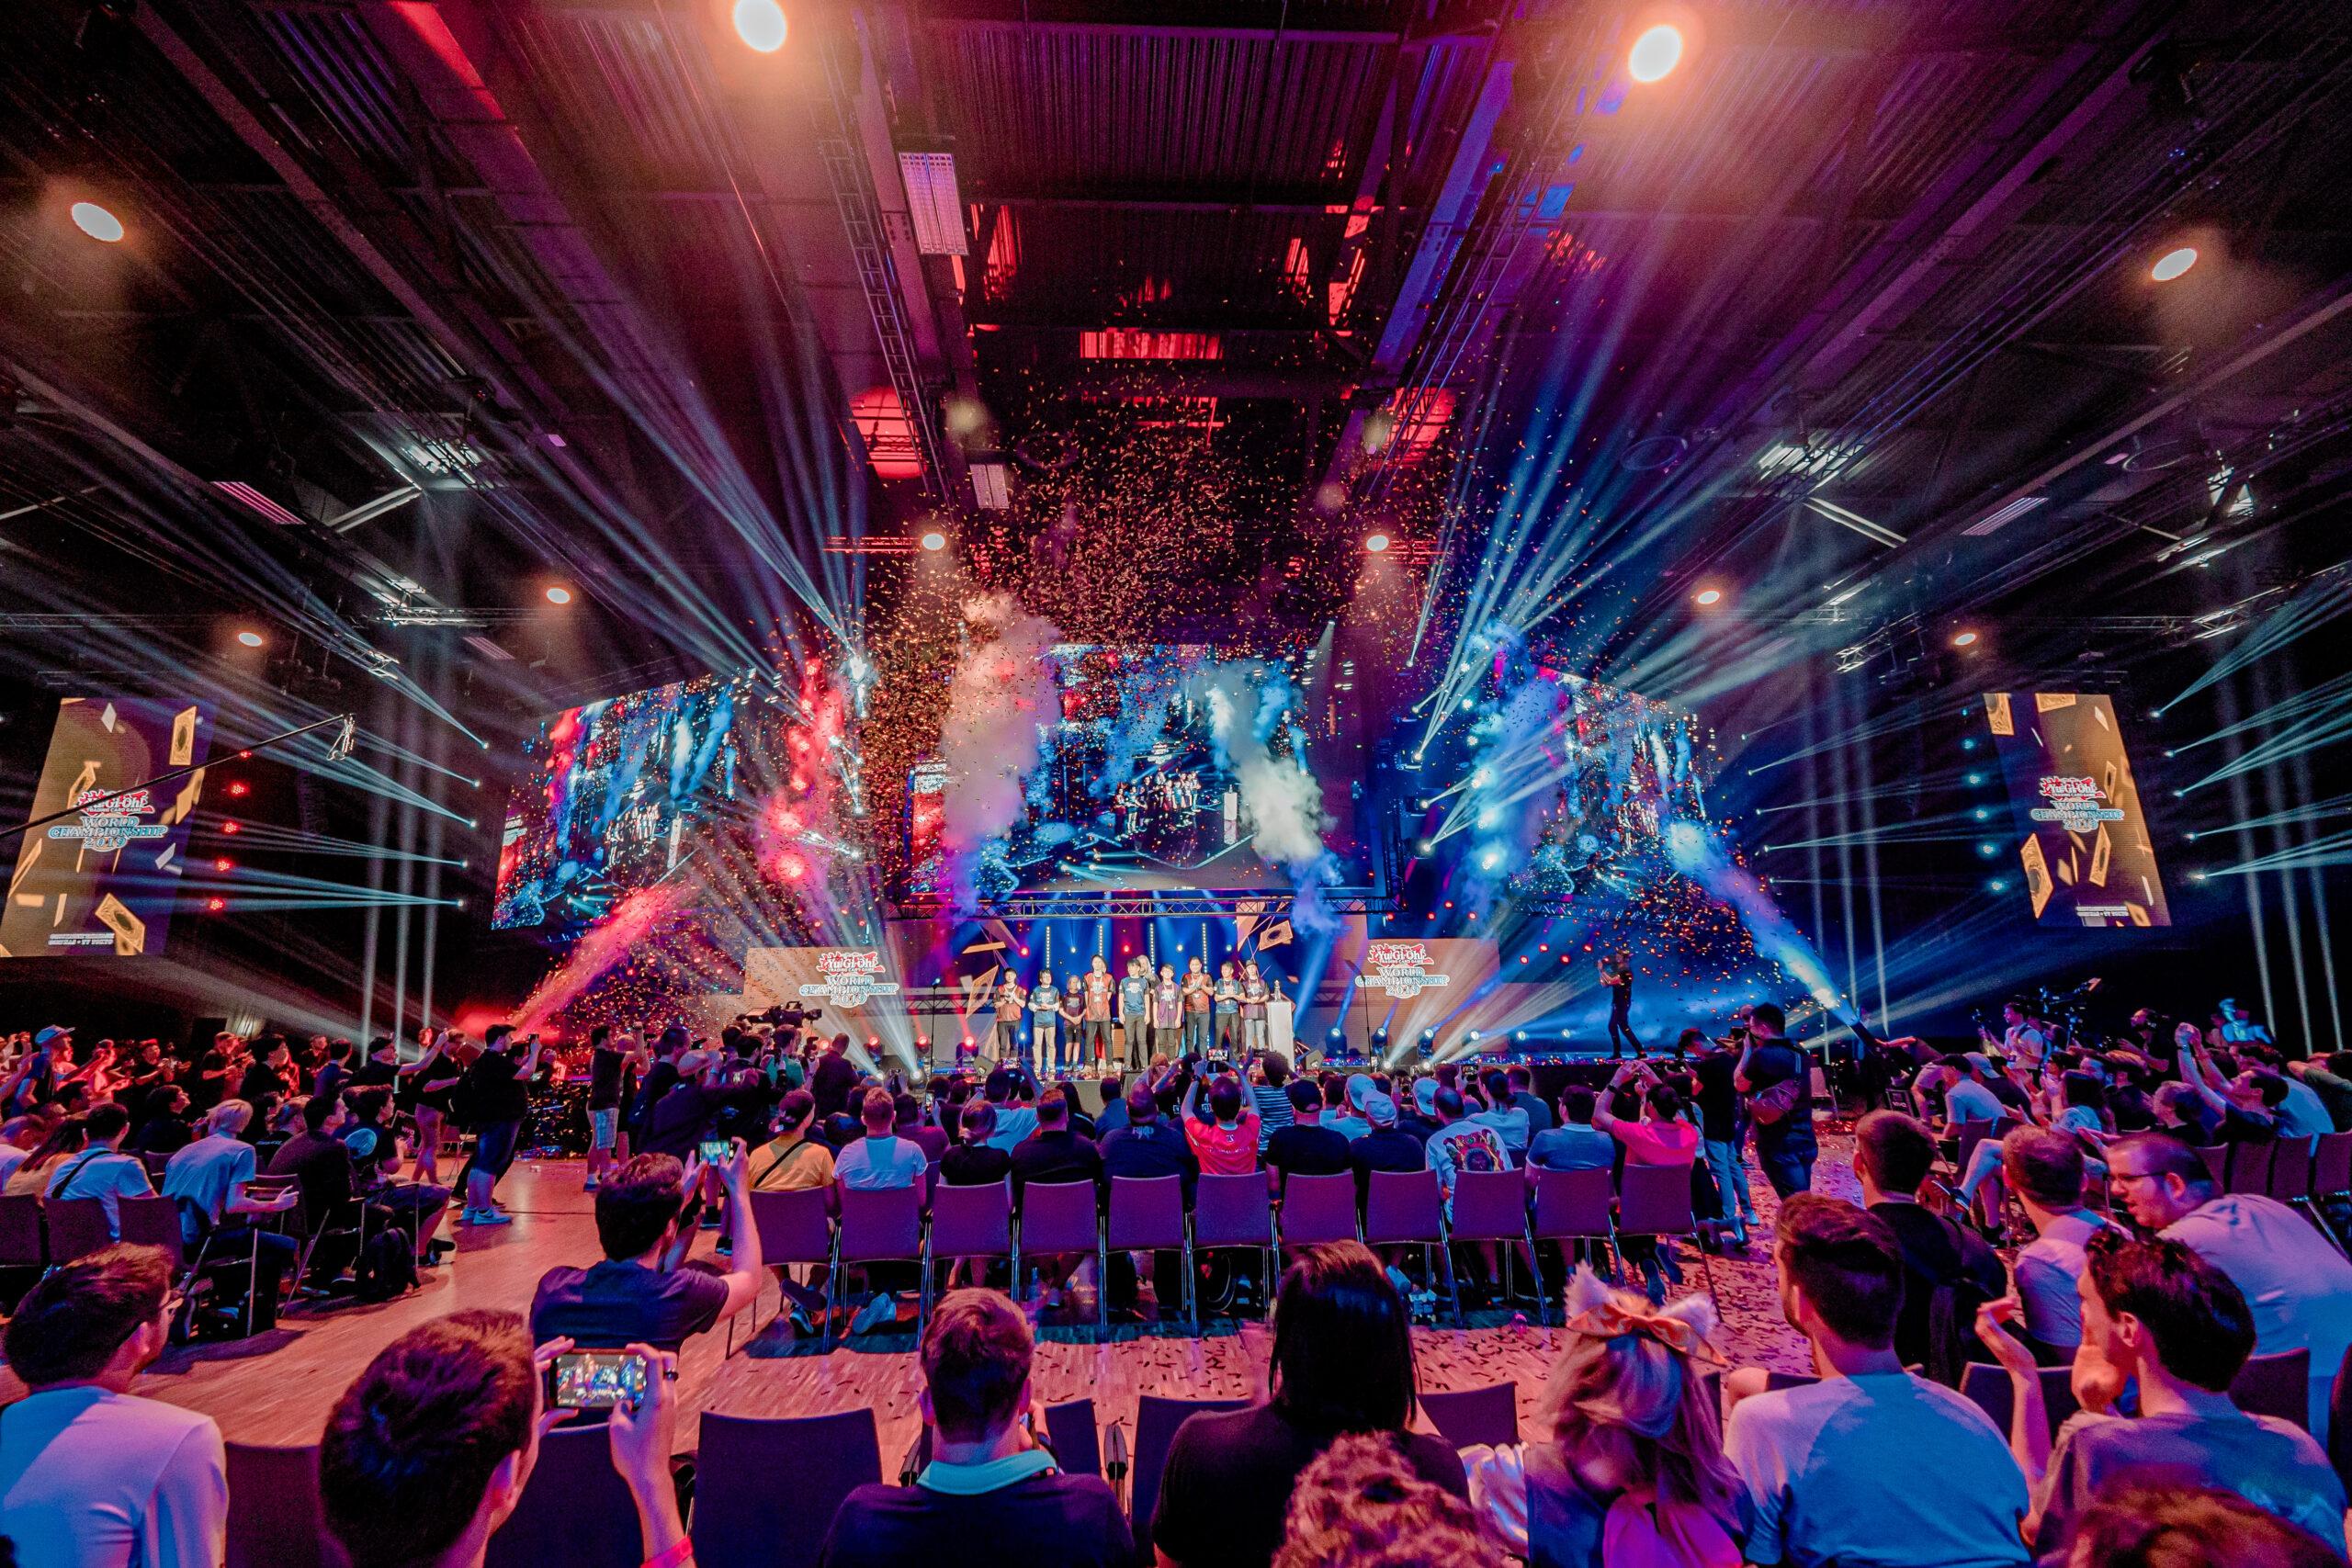 Yu-Gi-Oh! World Championship 2019